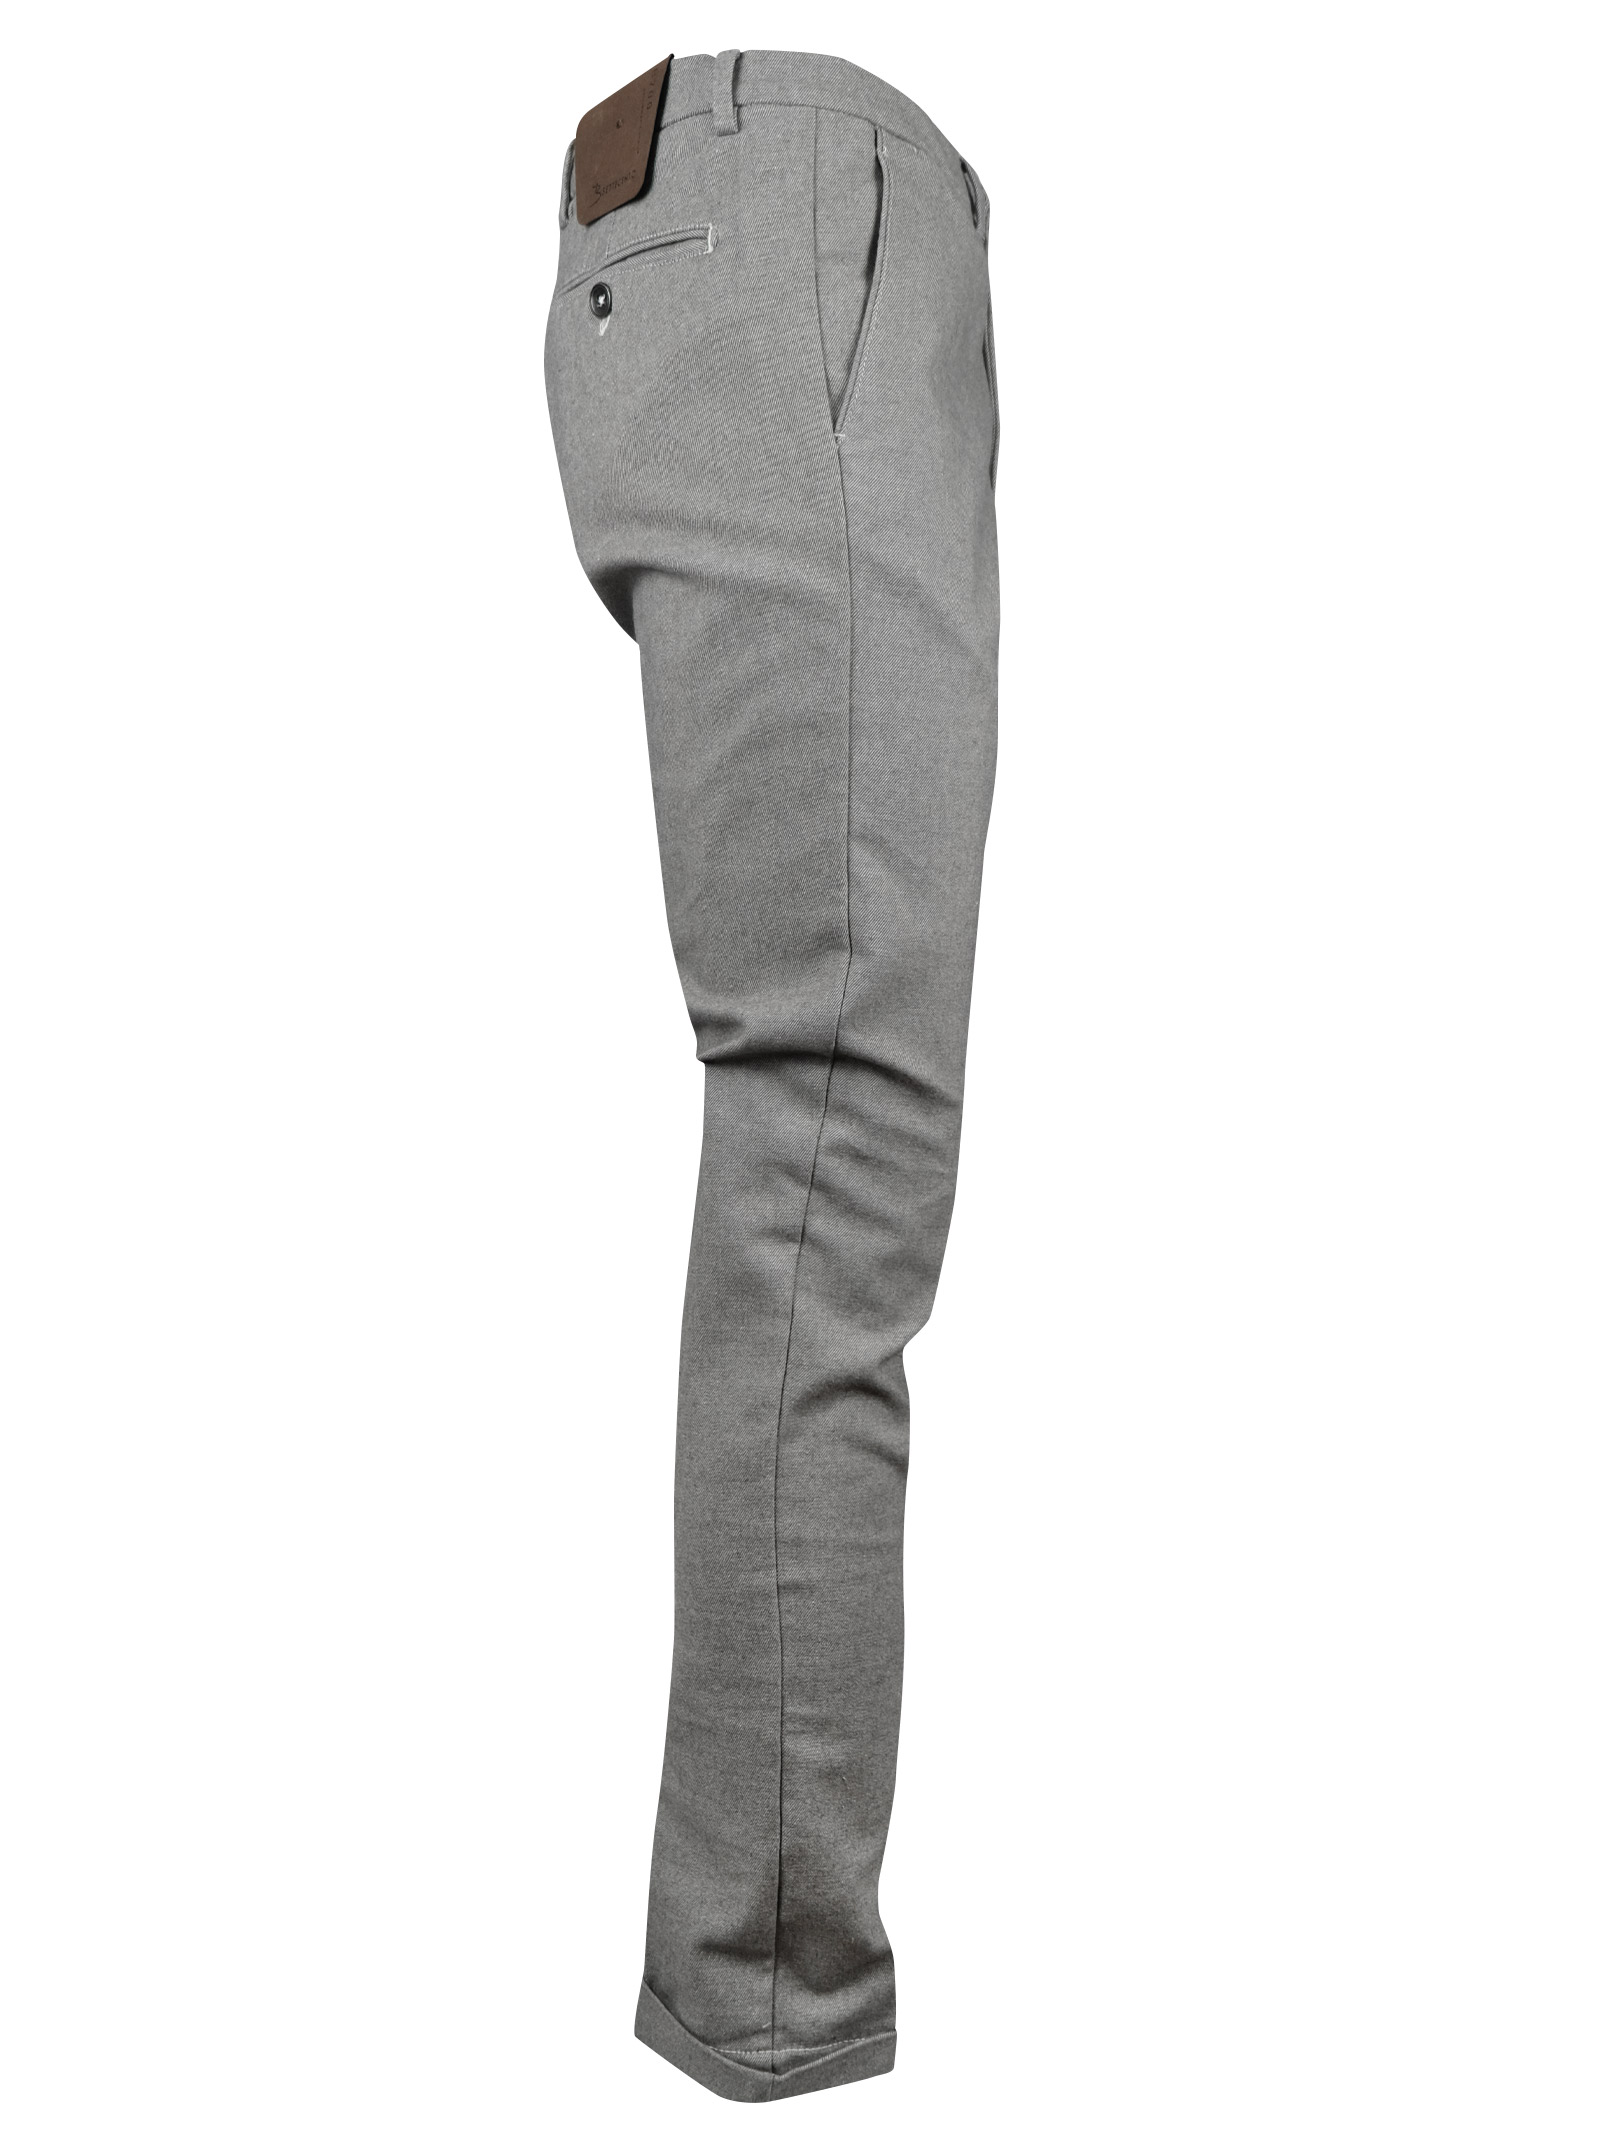 B700 | Trousers | MH700 855806